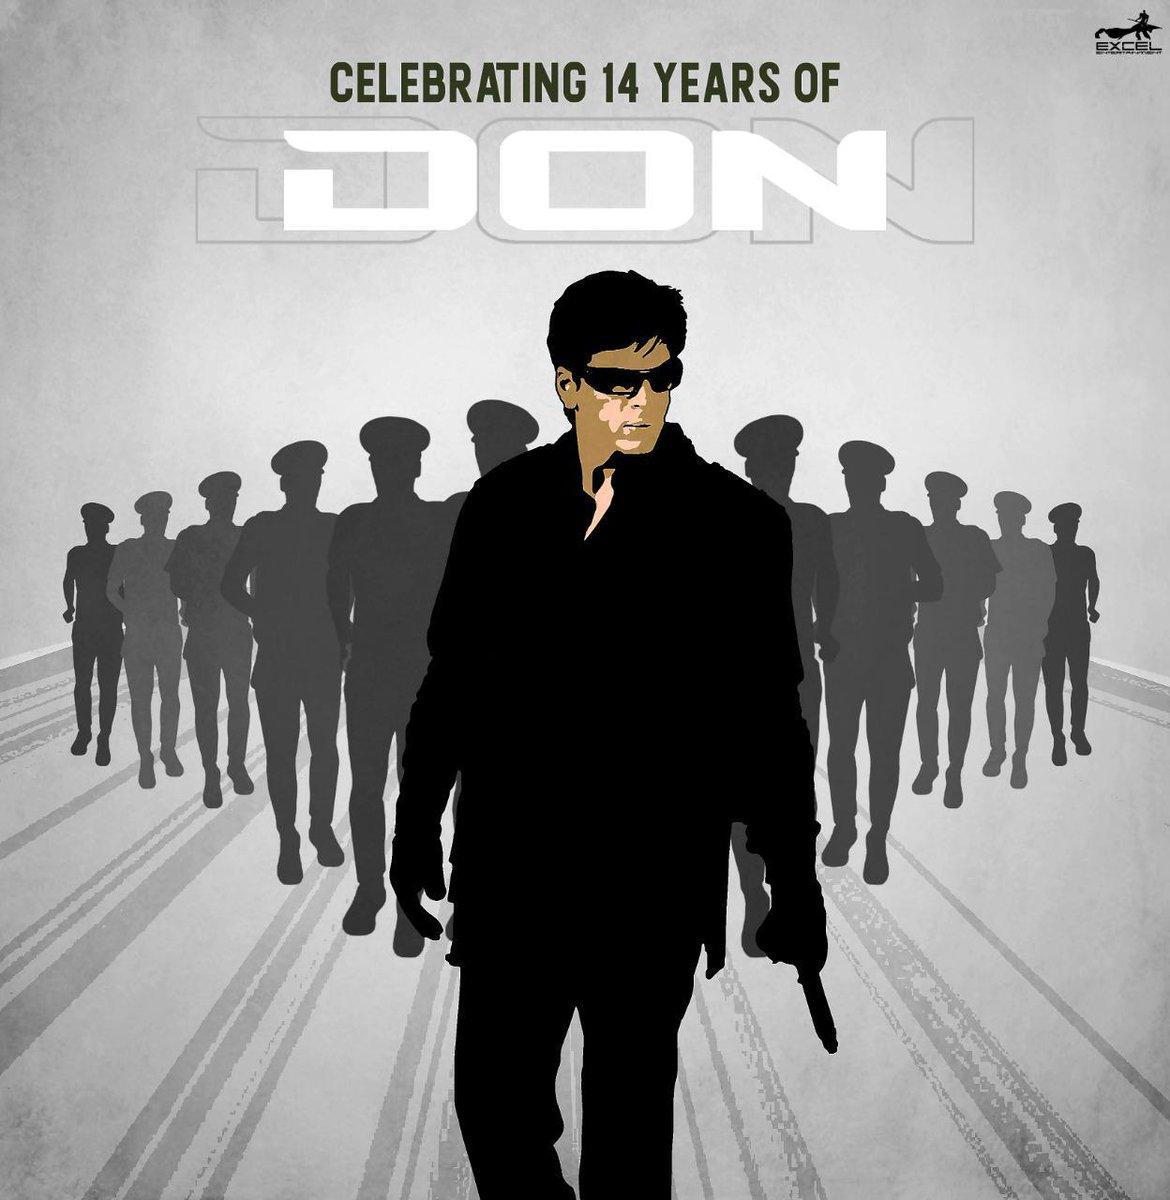 Time flies!  It's #14YearsOfDon already!  Even though #Don was a remake, @FarOutAkhtar owned the movie with his classy touch!  @iamsrk @priyankachopra @bomanirani @rampalarjun  #KareenaKapoorKhan @ishakonnects @ritesh_sid @Javedakhtarjadu @ShankarEhsanLoy #KUMohanan @excelmovies